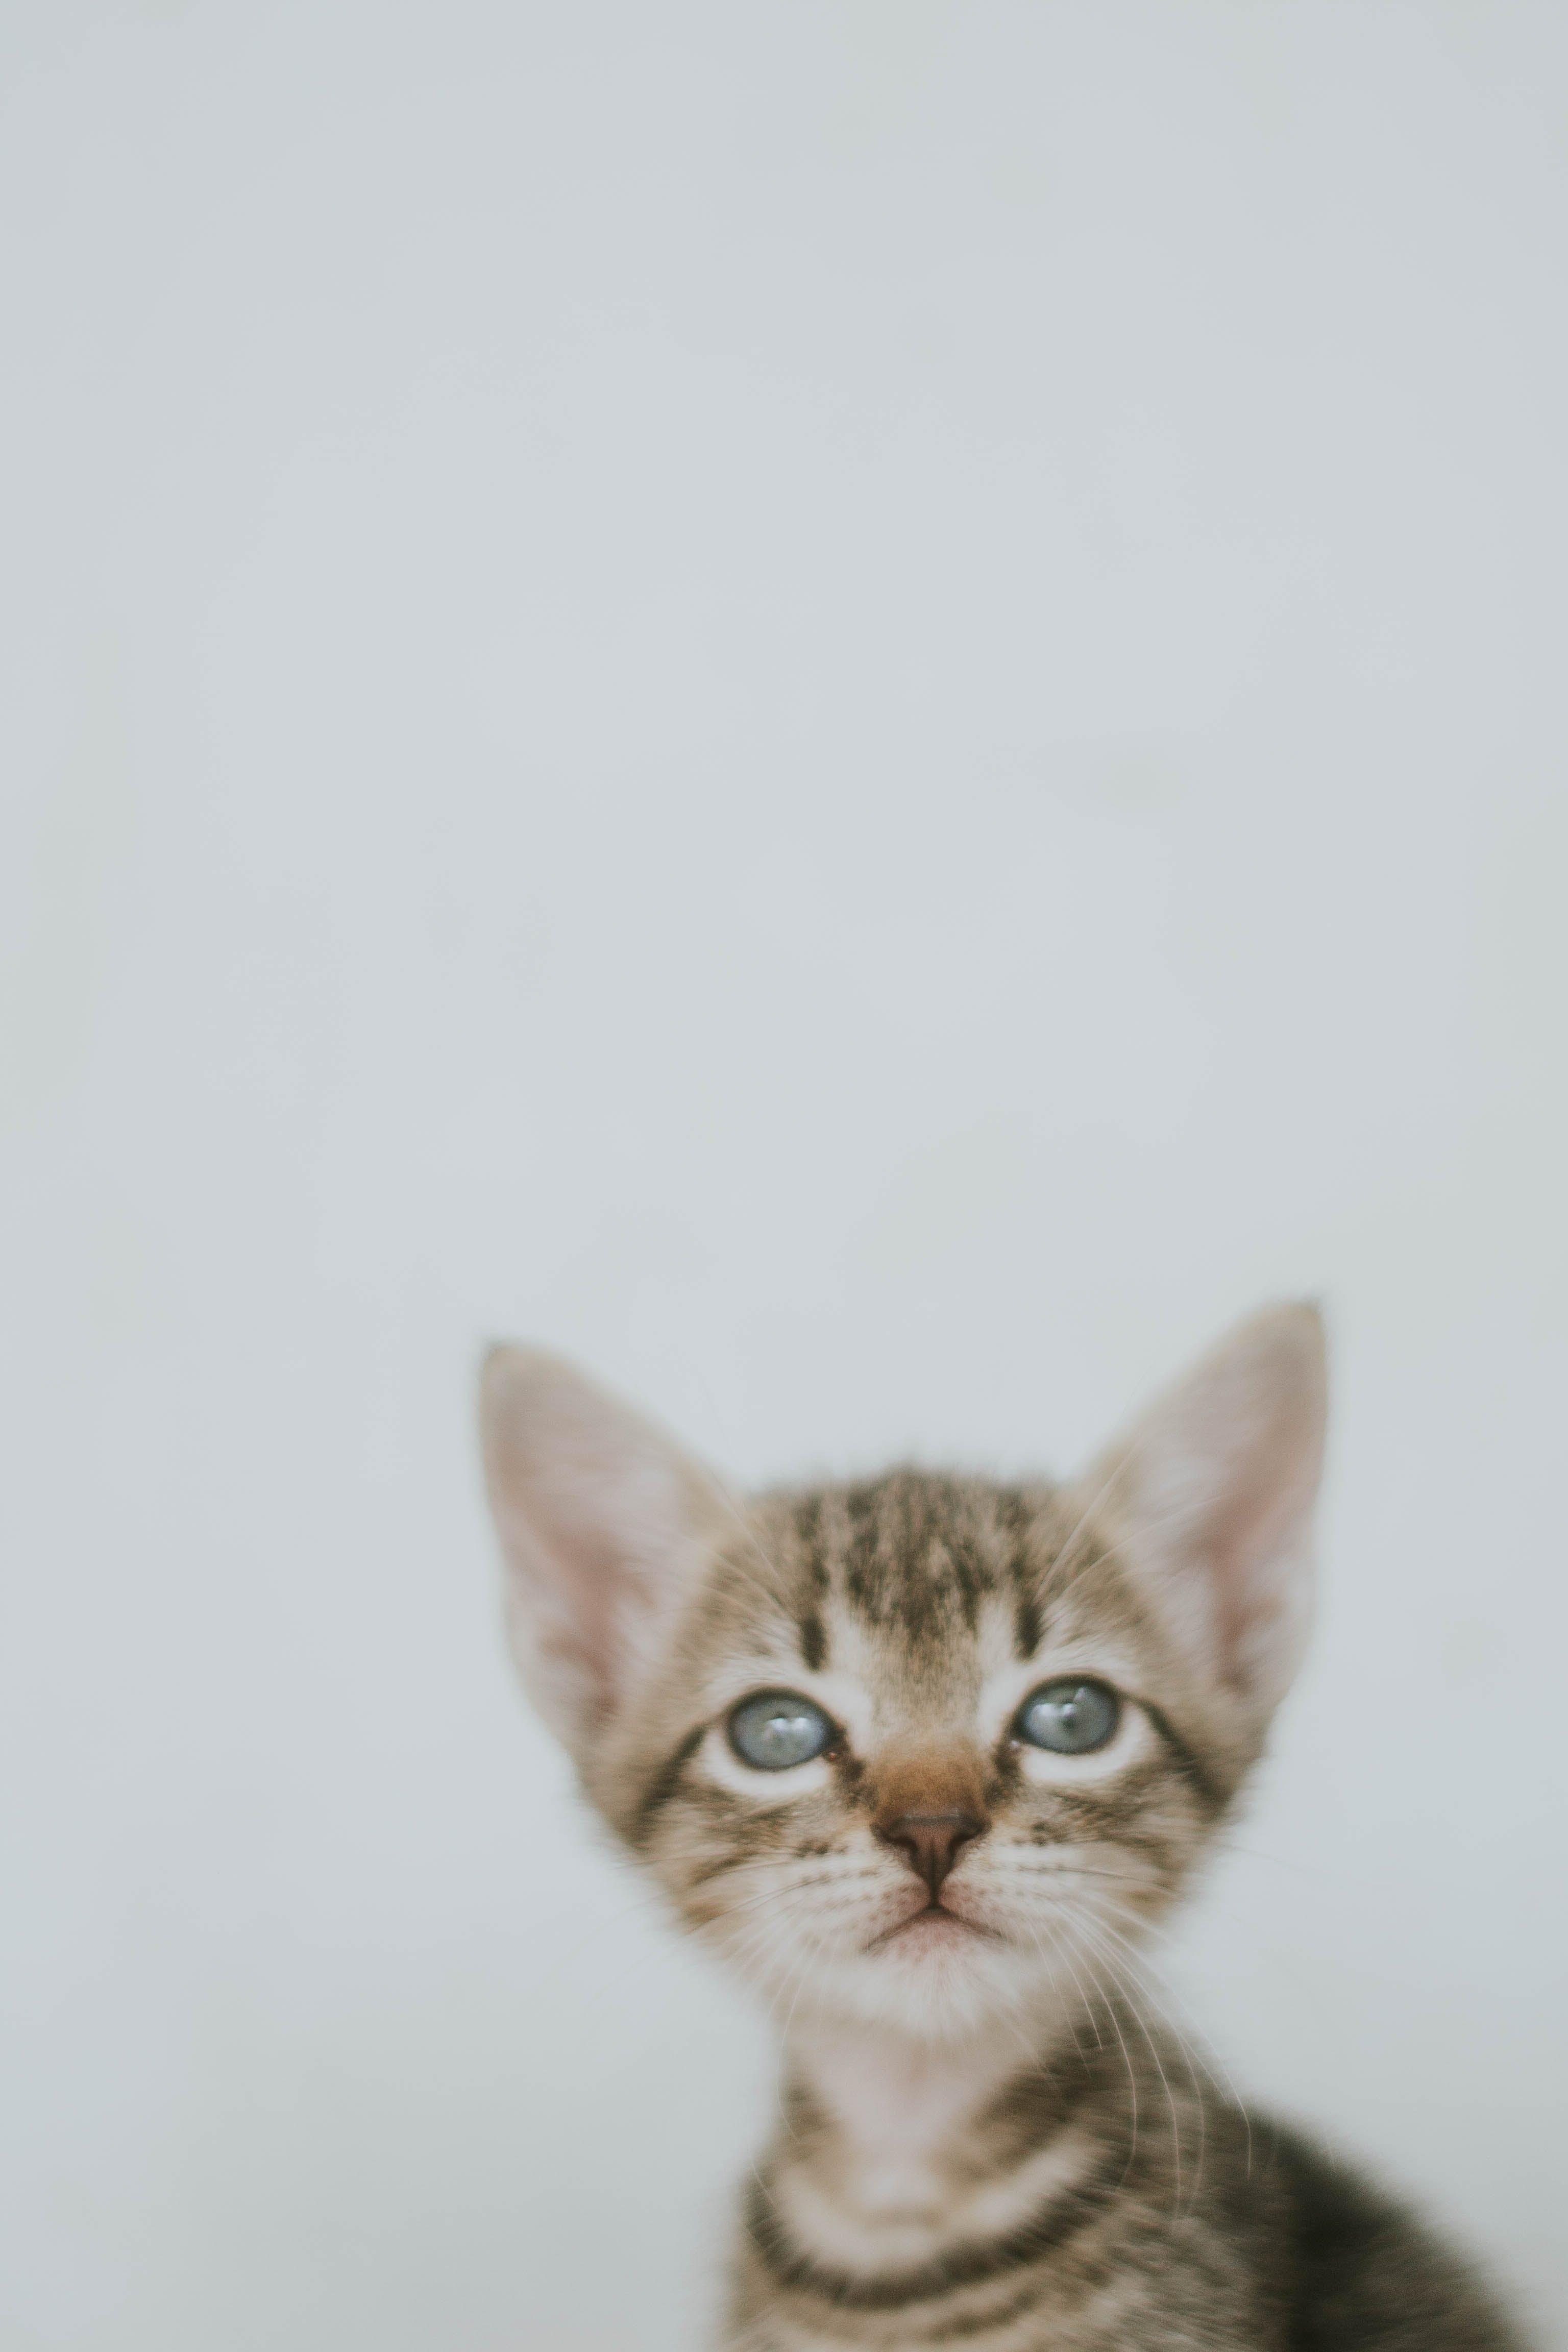 Close-Up Photo of Tabby Kitten